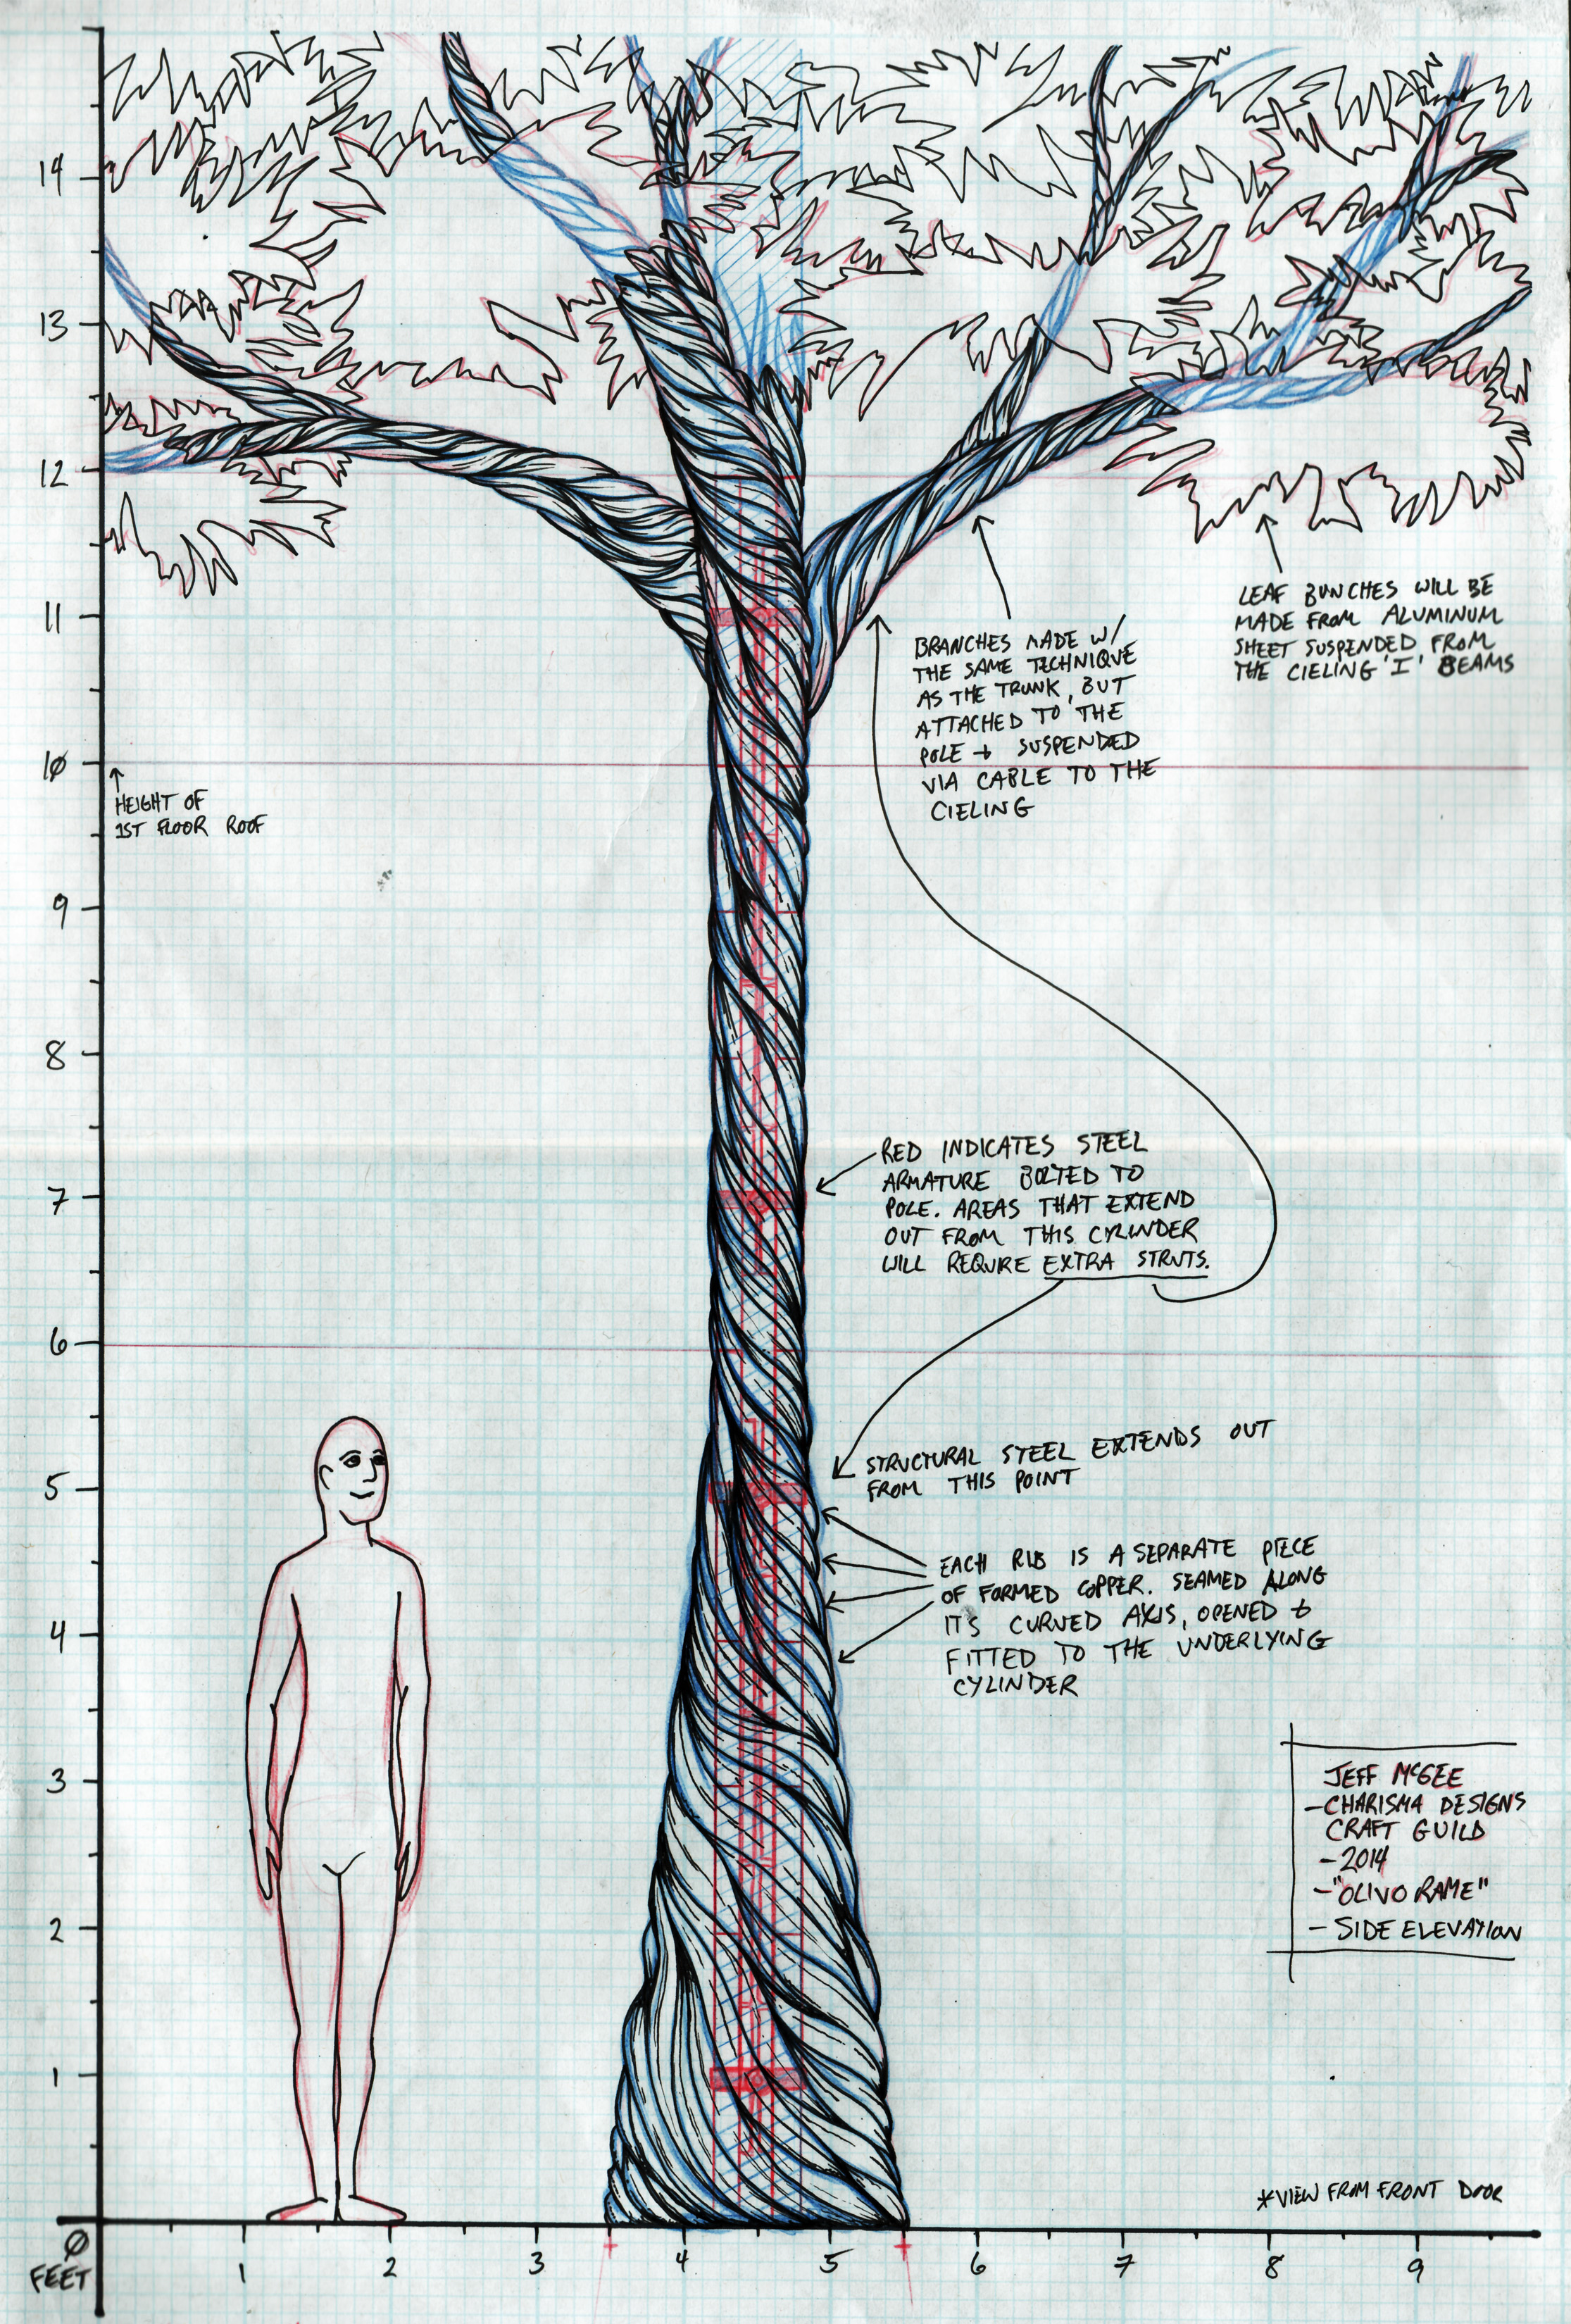 Sketchbook1/SideElevation300dpi.jpg